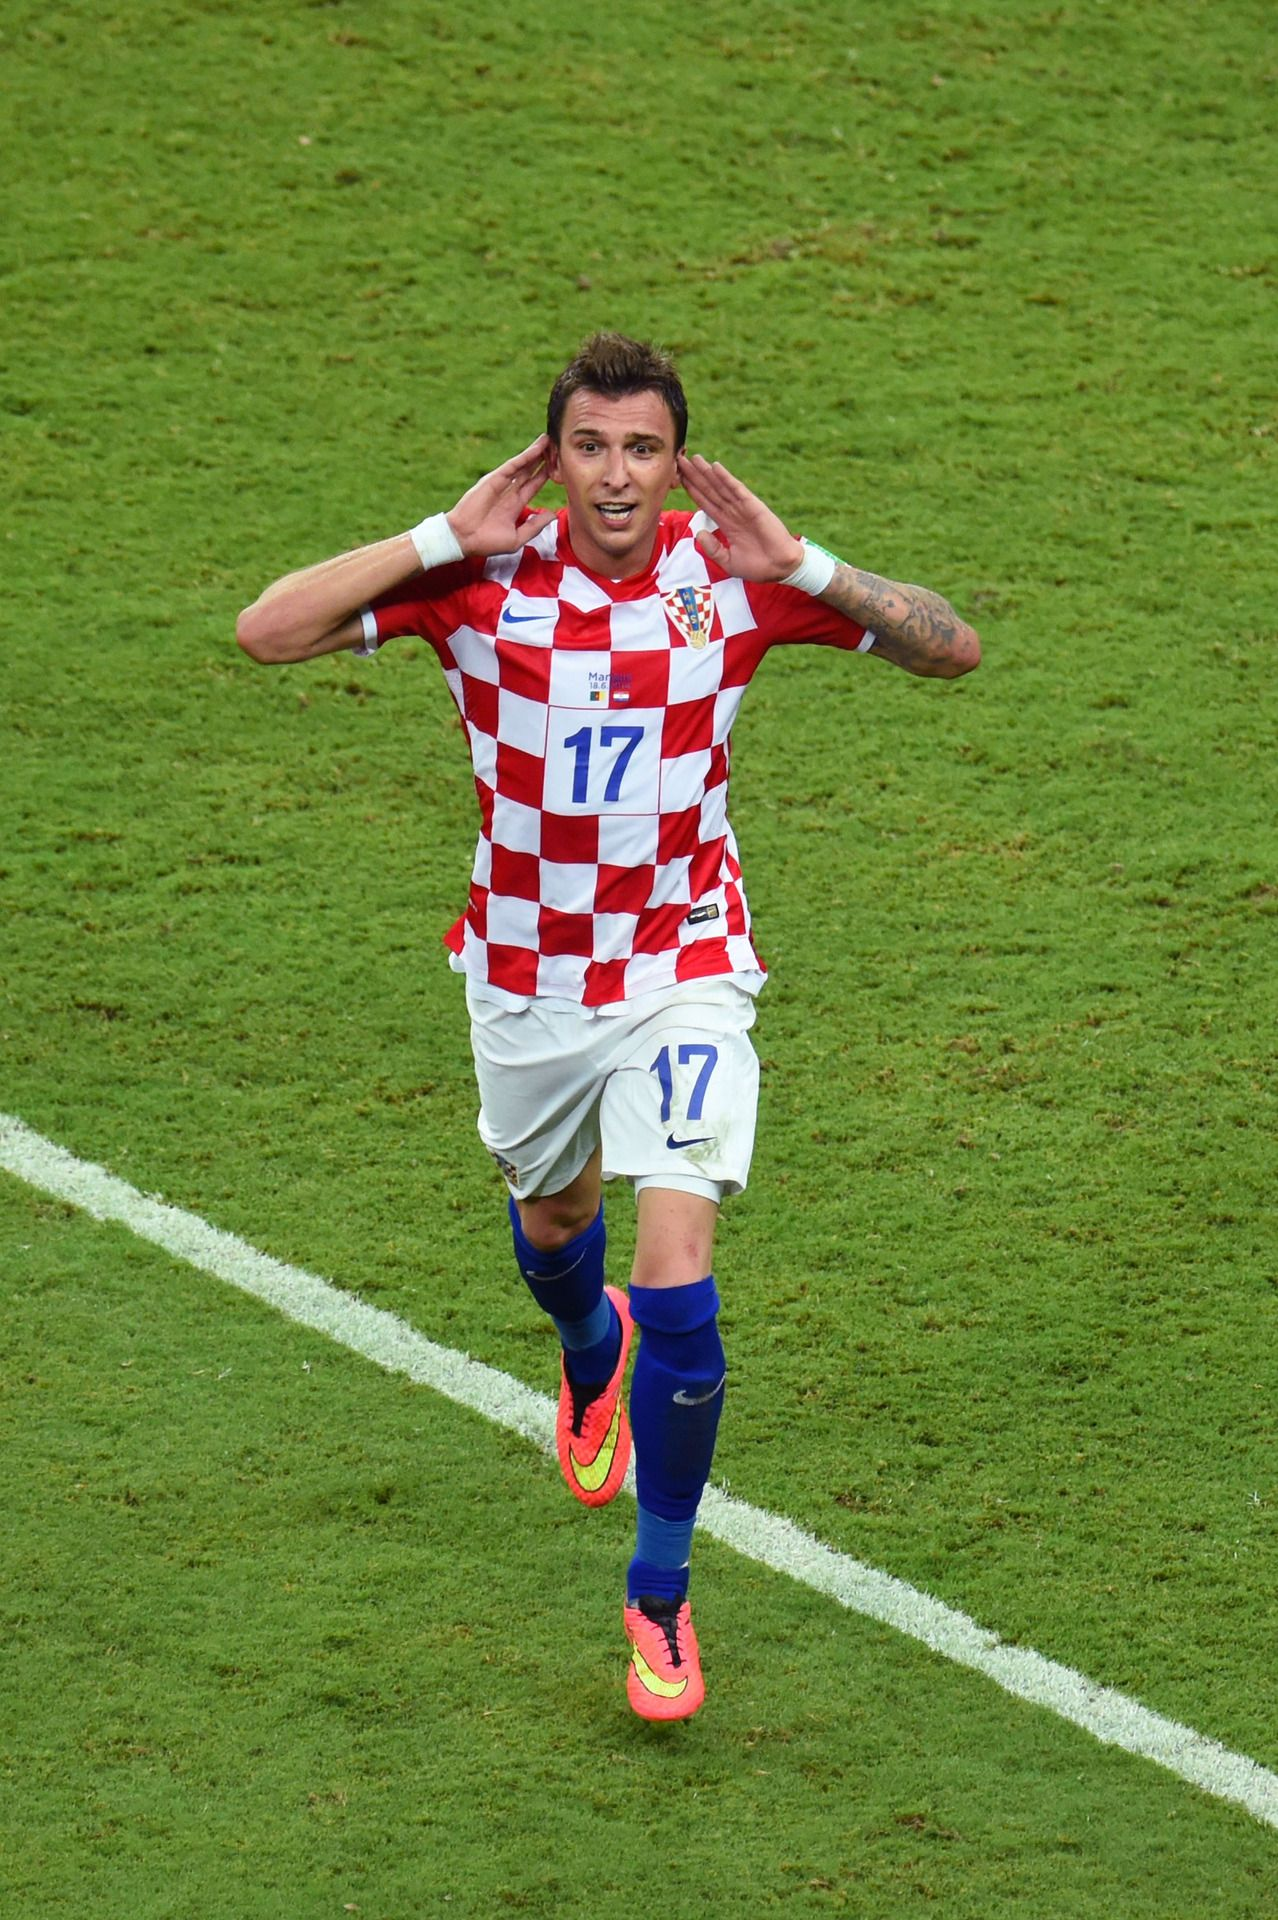 Mario Mandzukic of Croatia NT